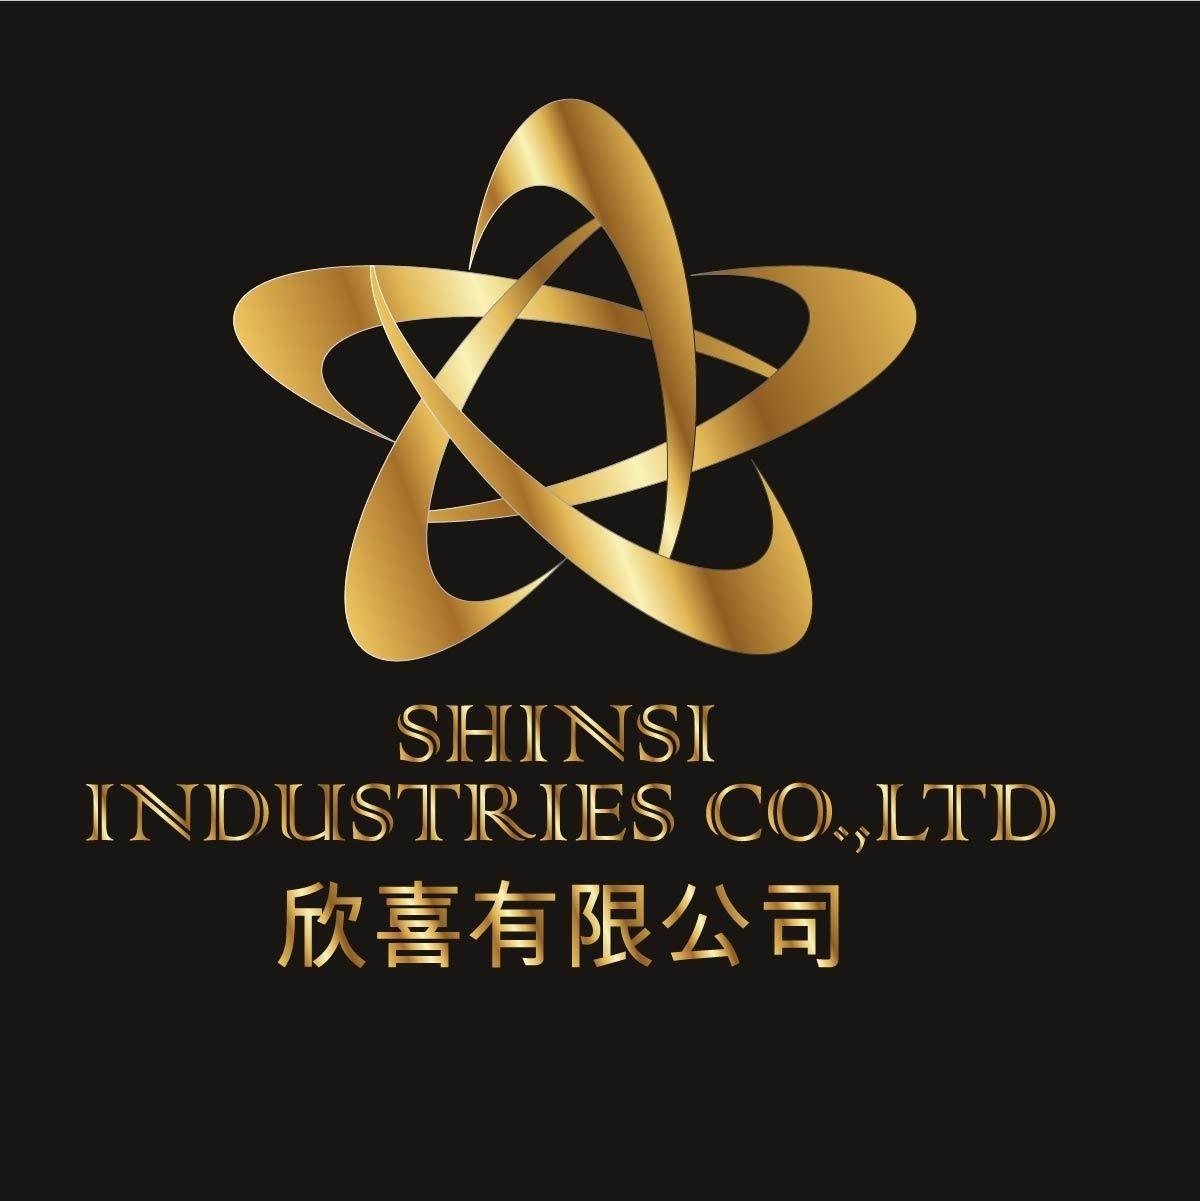 Shin Si Industries Co., Ltd